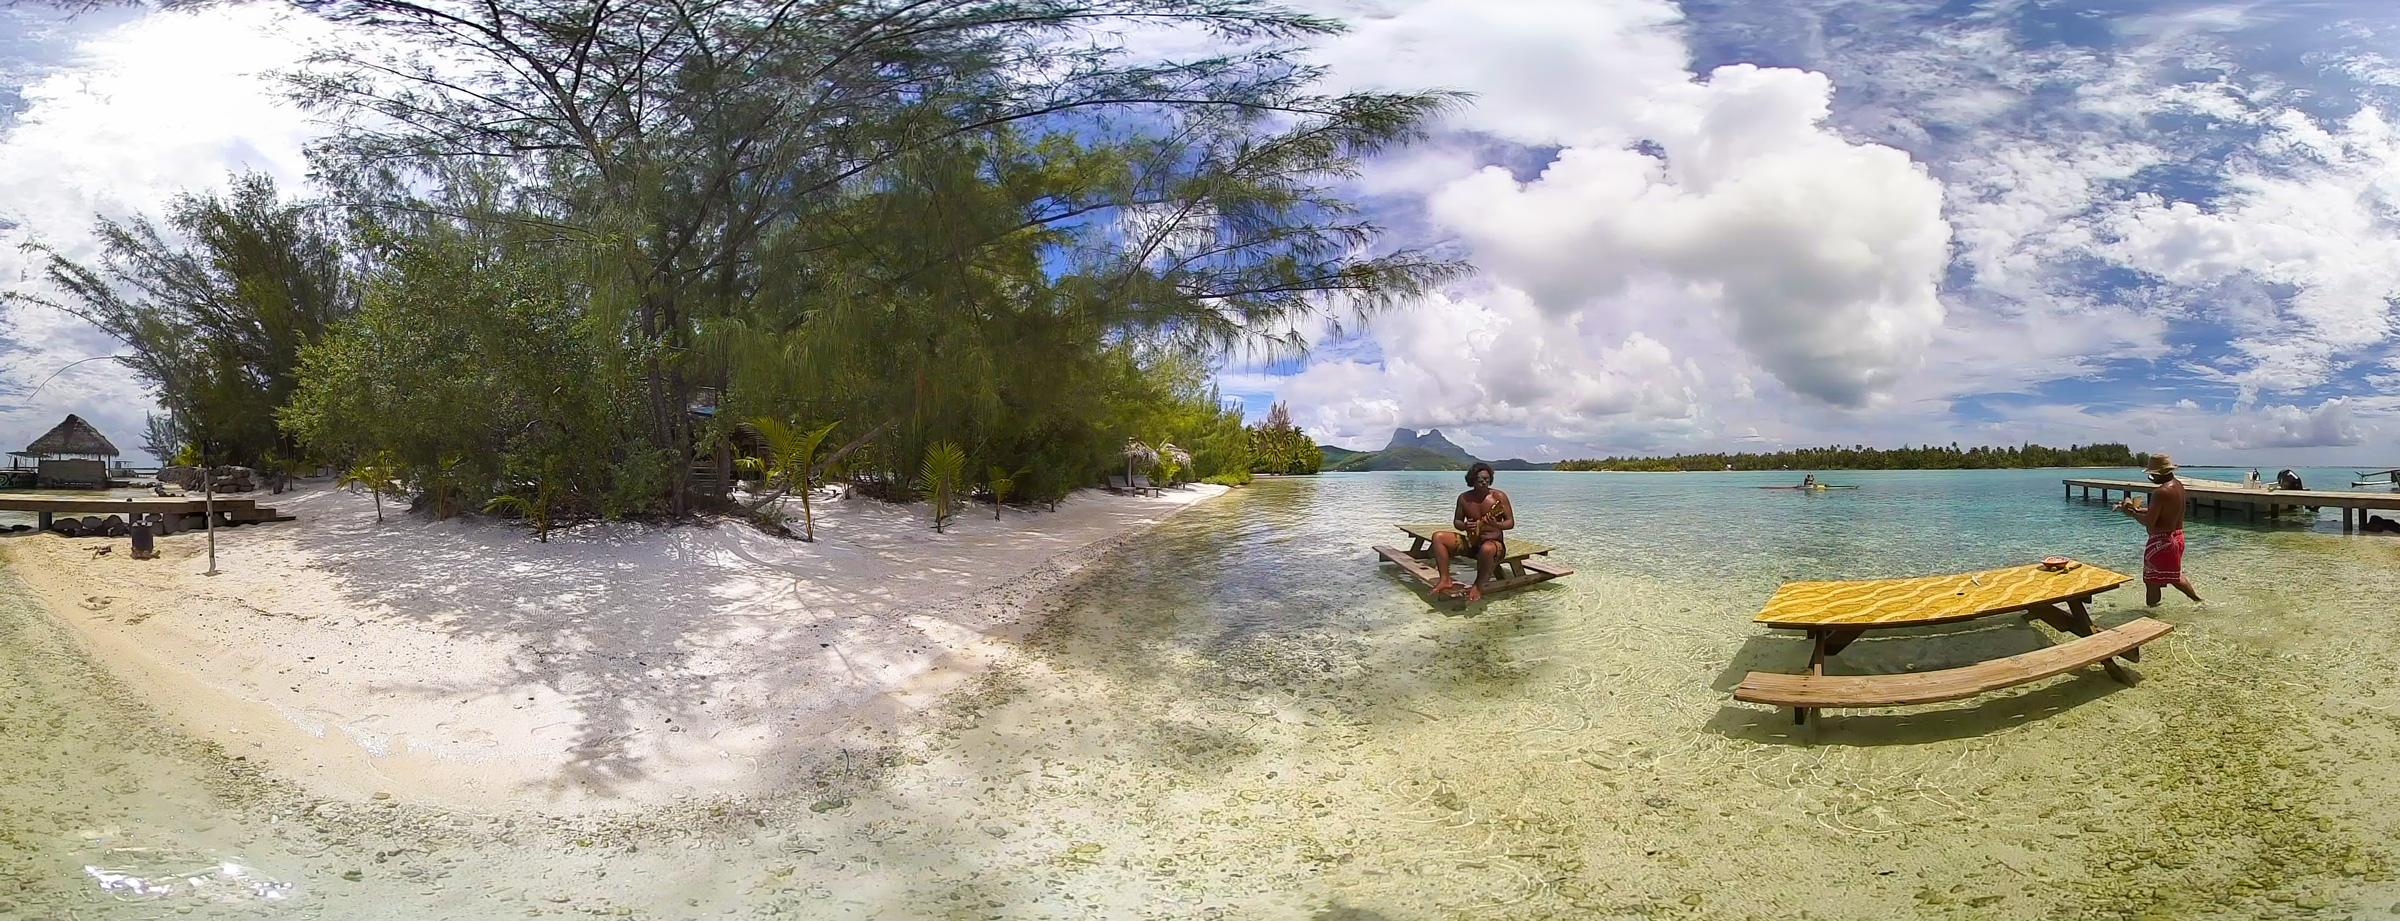 Take-The-Ride-VR_TahitiVR_Motu_2400px.jpg